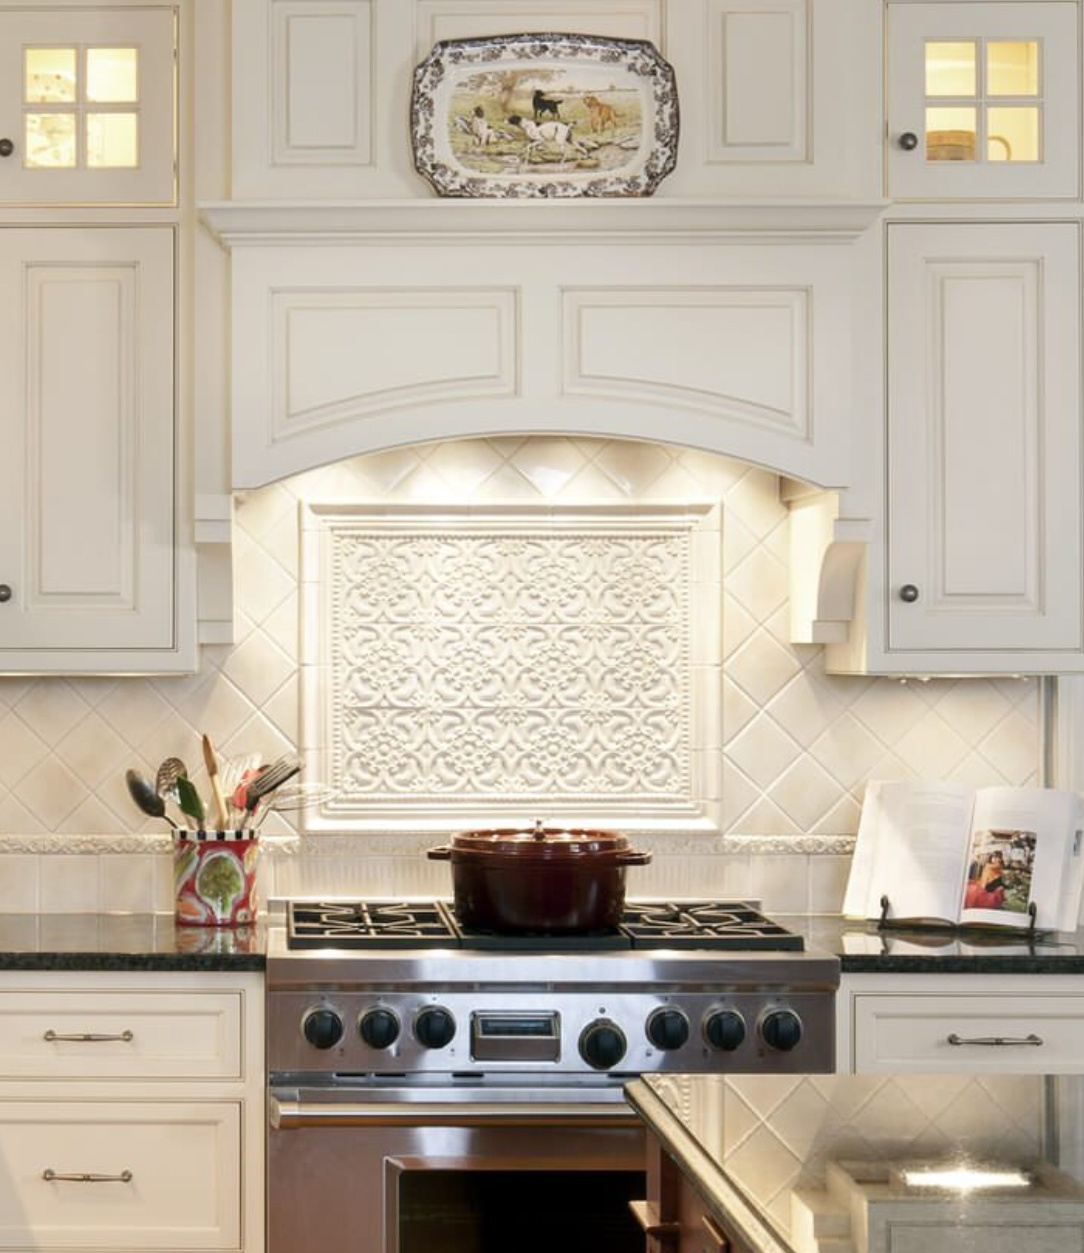 Top 10 Creative Kitchen Backsplash Trends